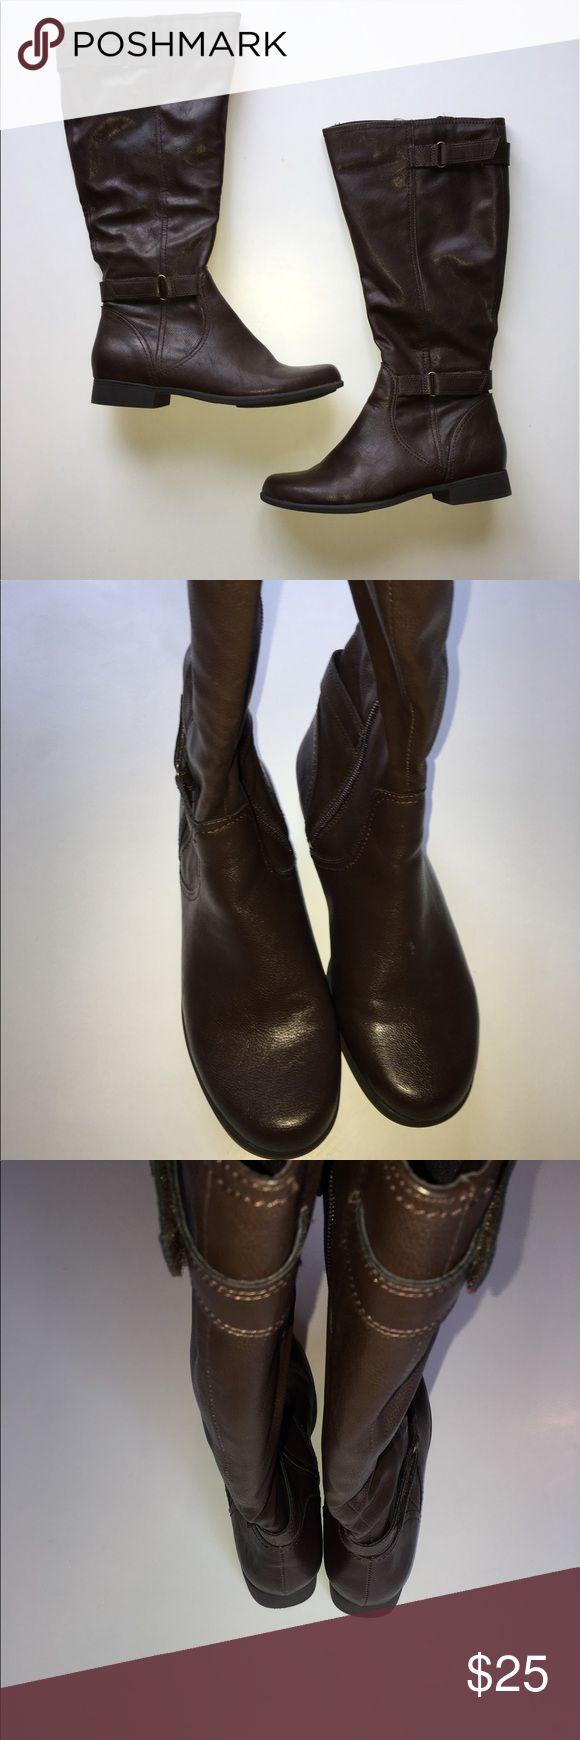 Women's Hush Puppies Boots Size 8 Women's Hush Puppies boots in great condition! Size 8 Hush Puppies Shoes